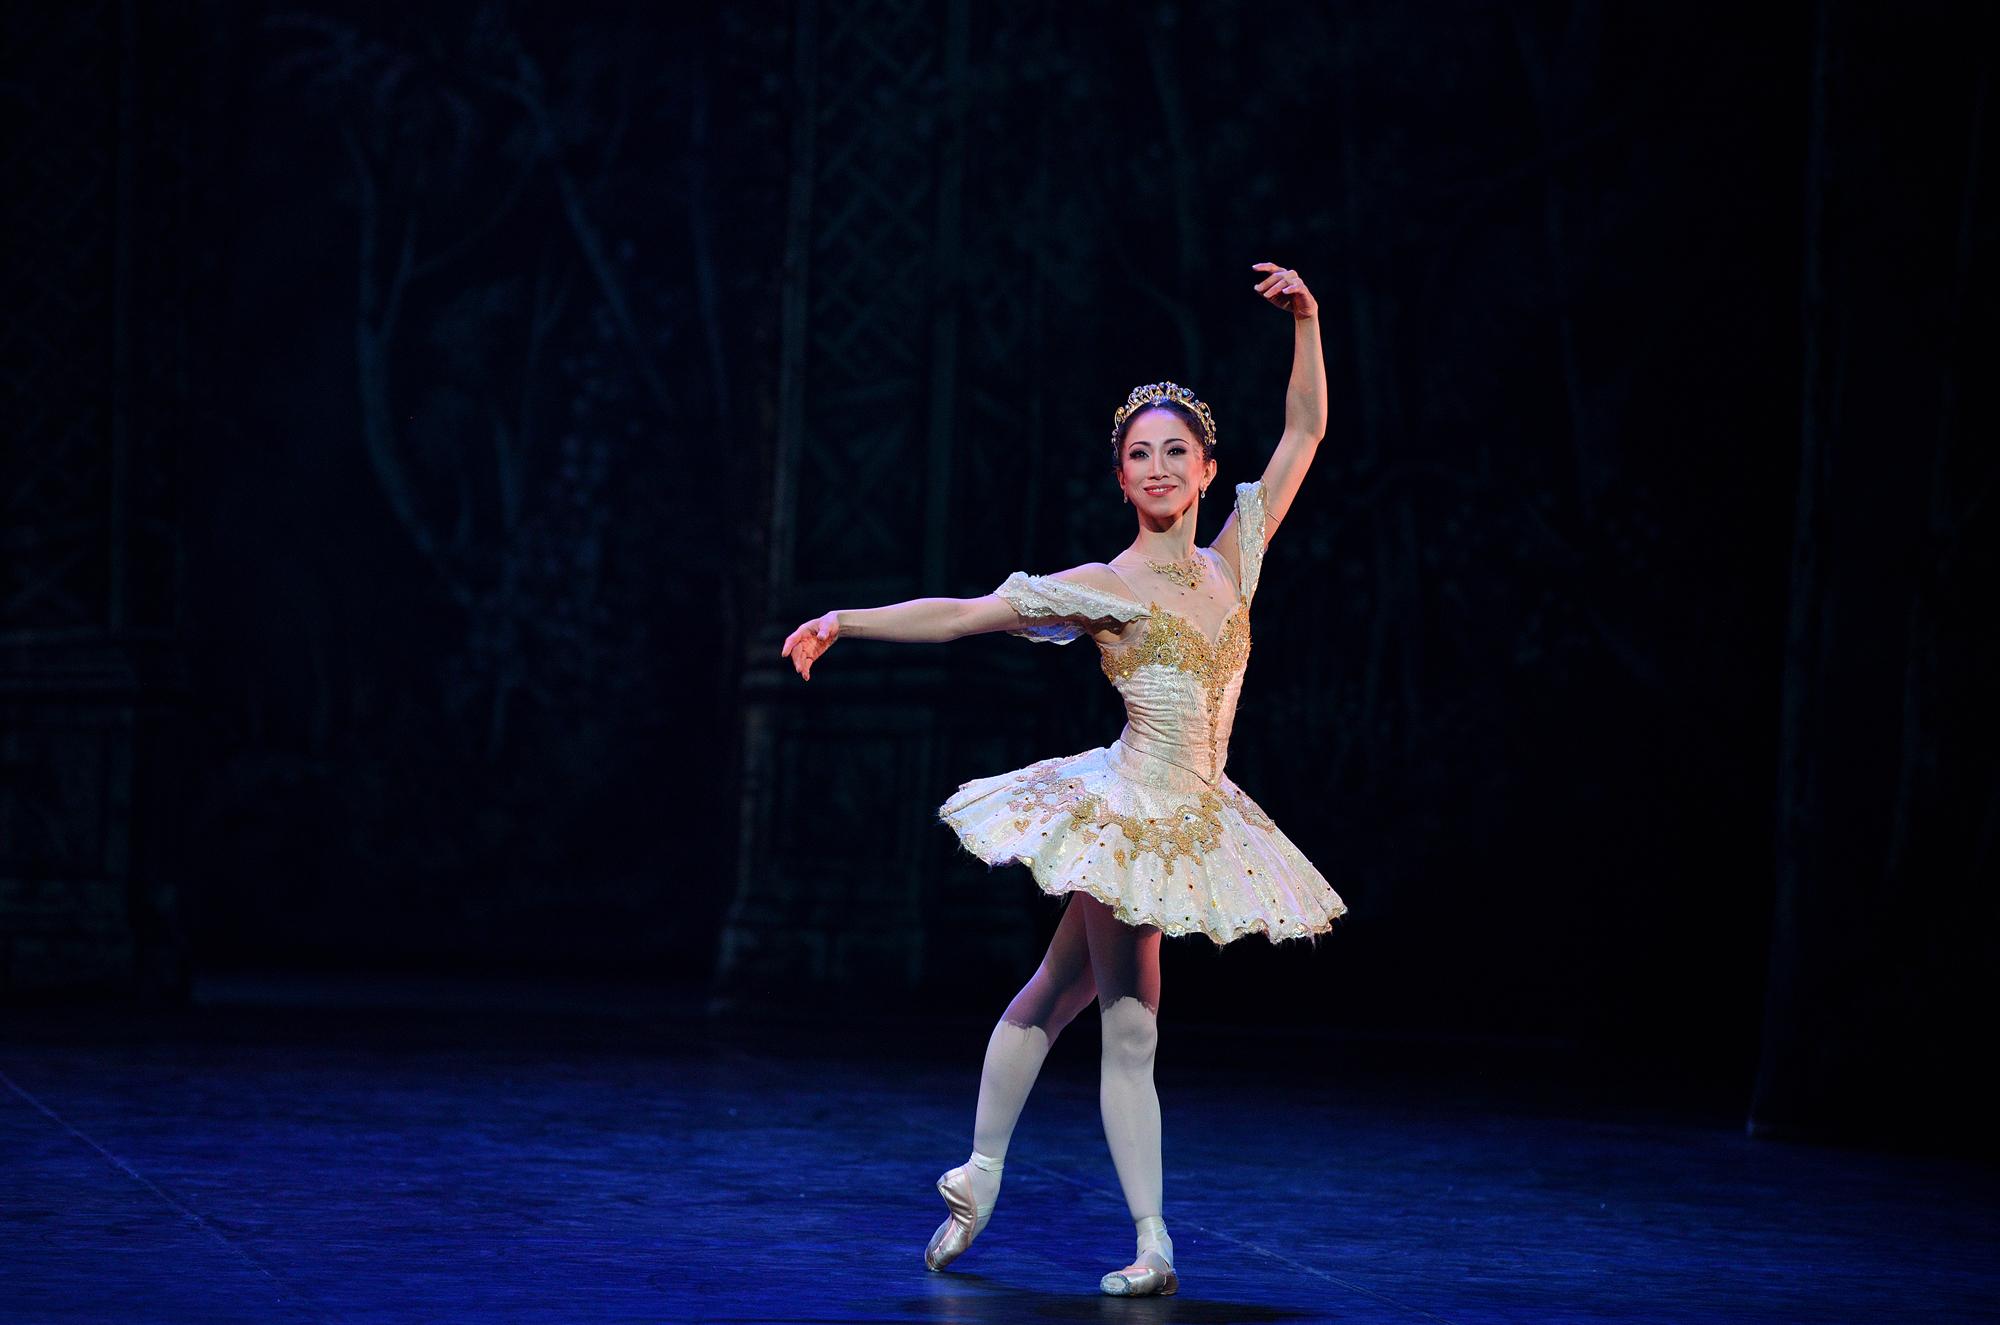 Nutcracker Delights in Rehearsal | English National Ballet #WorldBalletDay